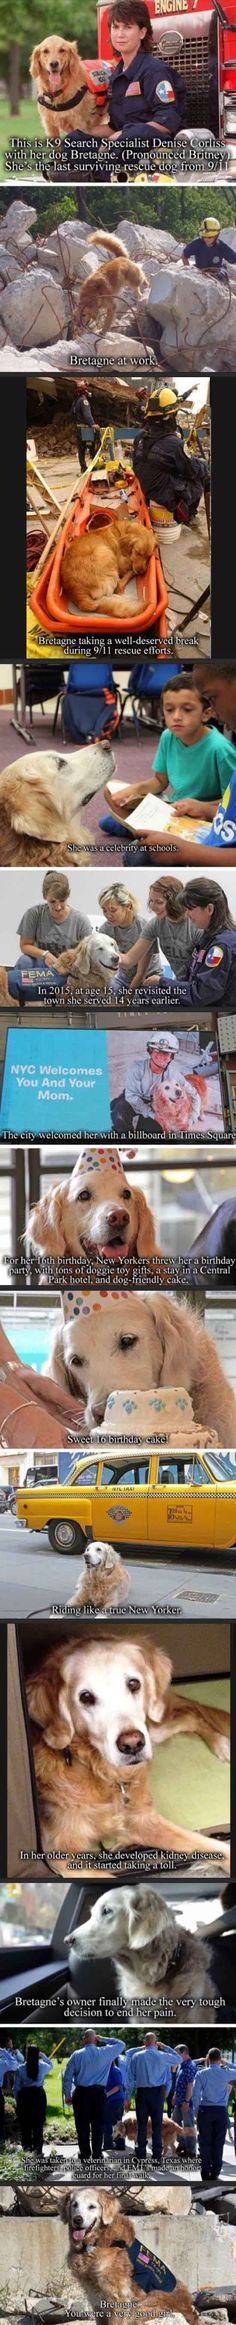 All Dogs Go to Heaven ibeebz.com/